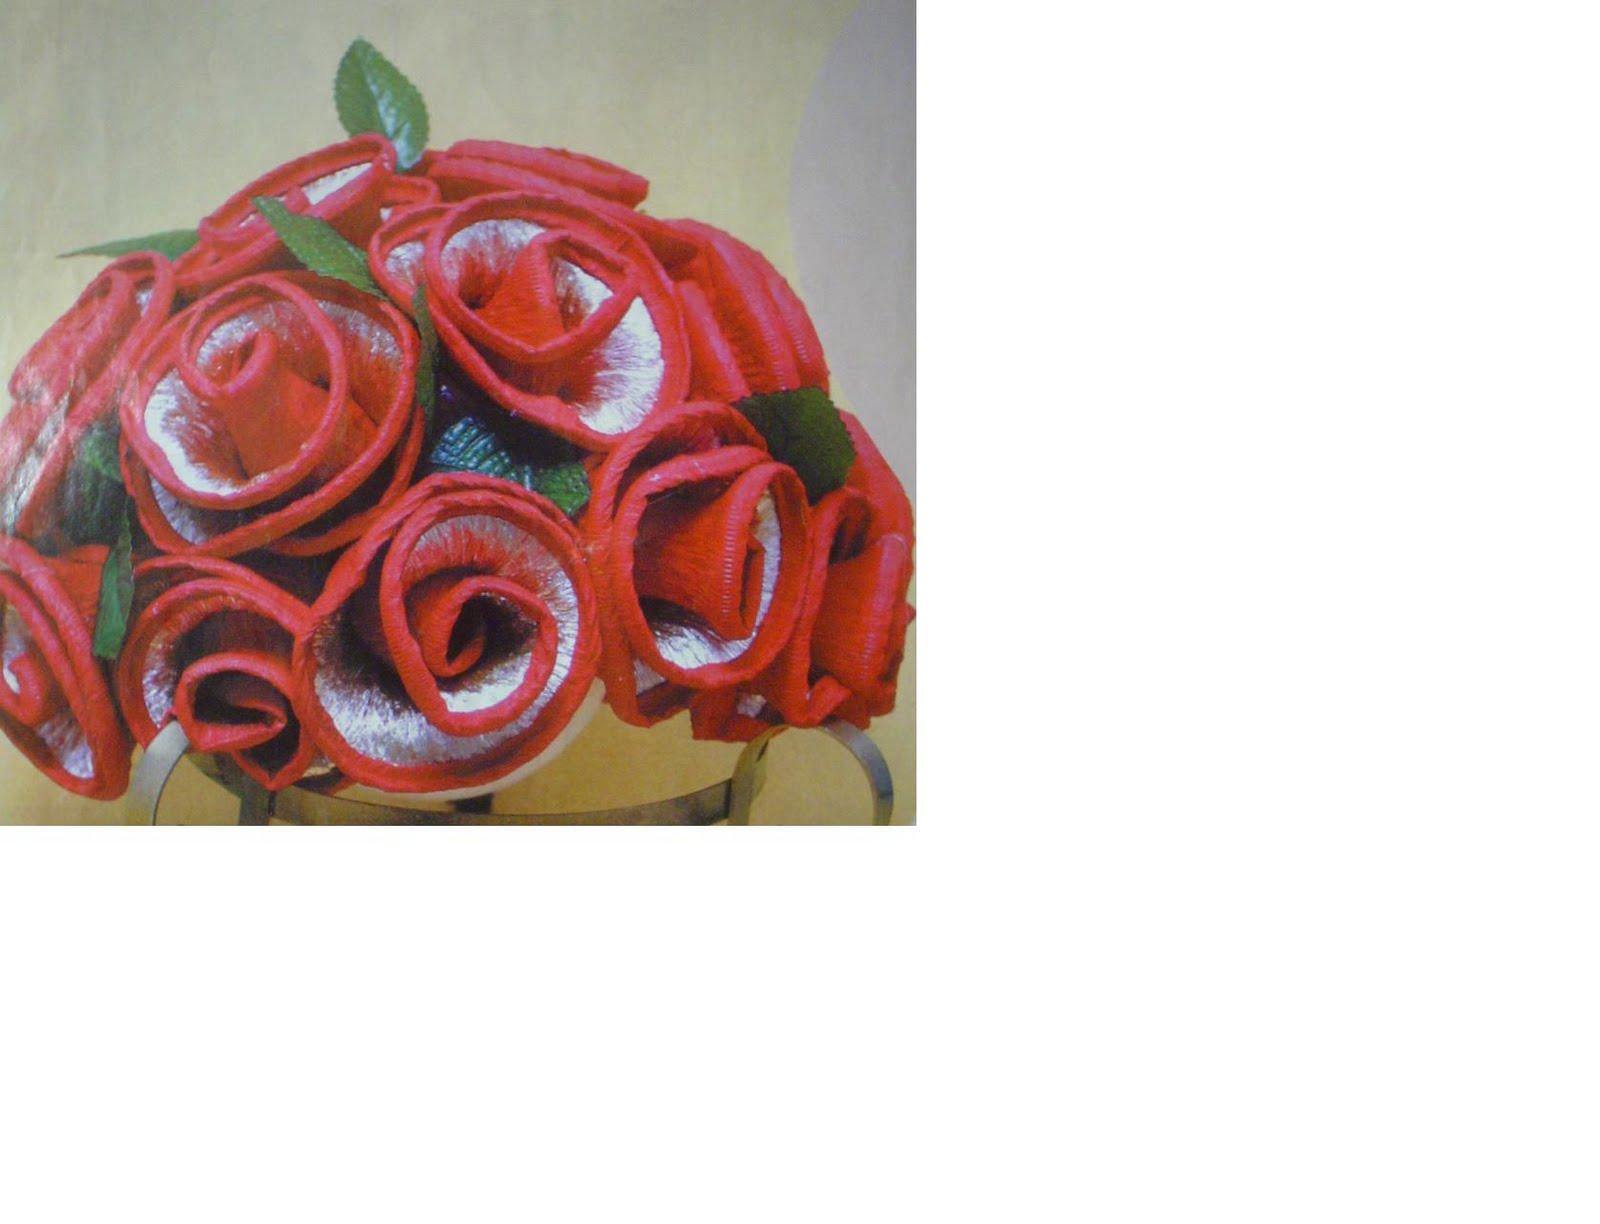 Estas flores são feitas de papel crepon e o miolo delas e recheado